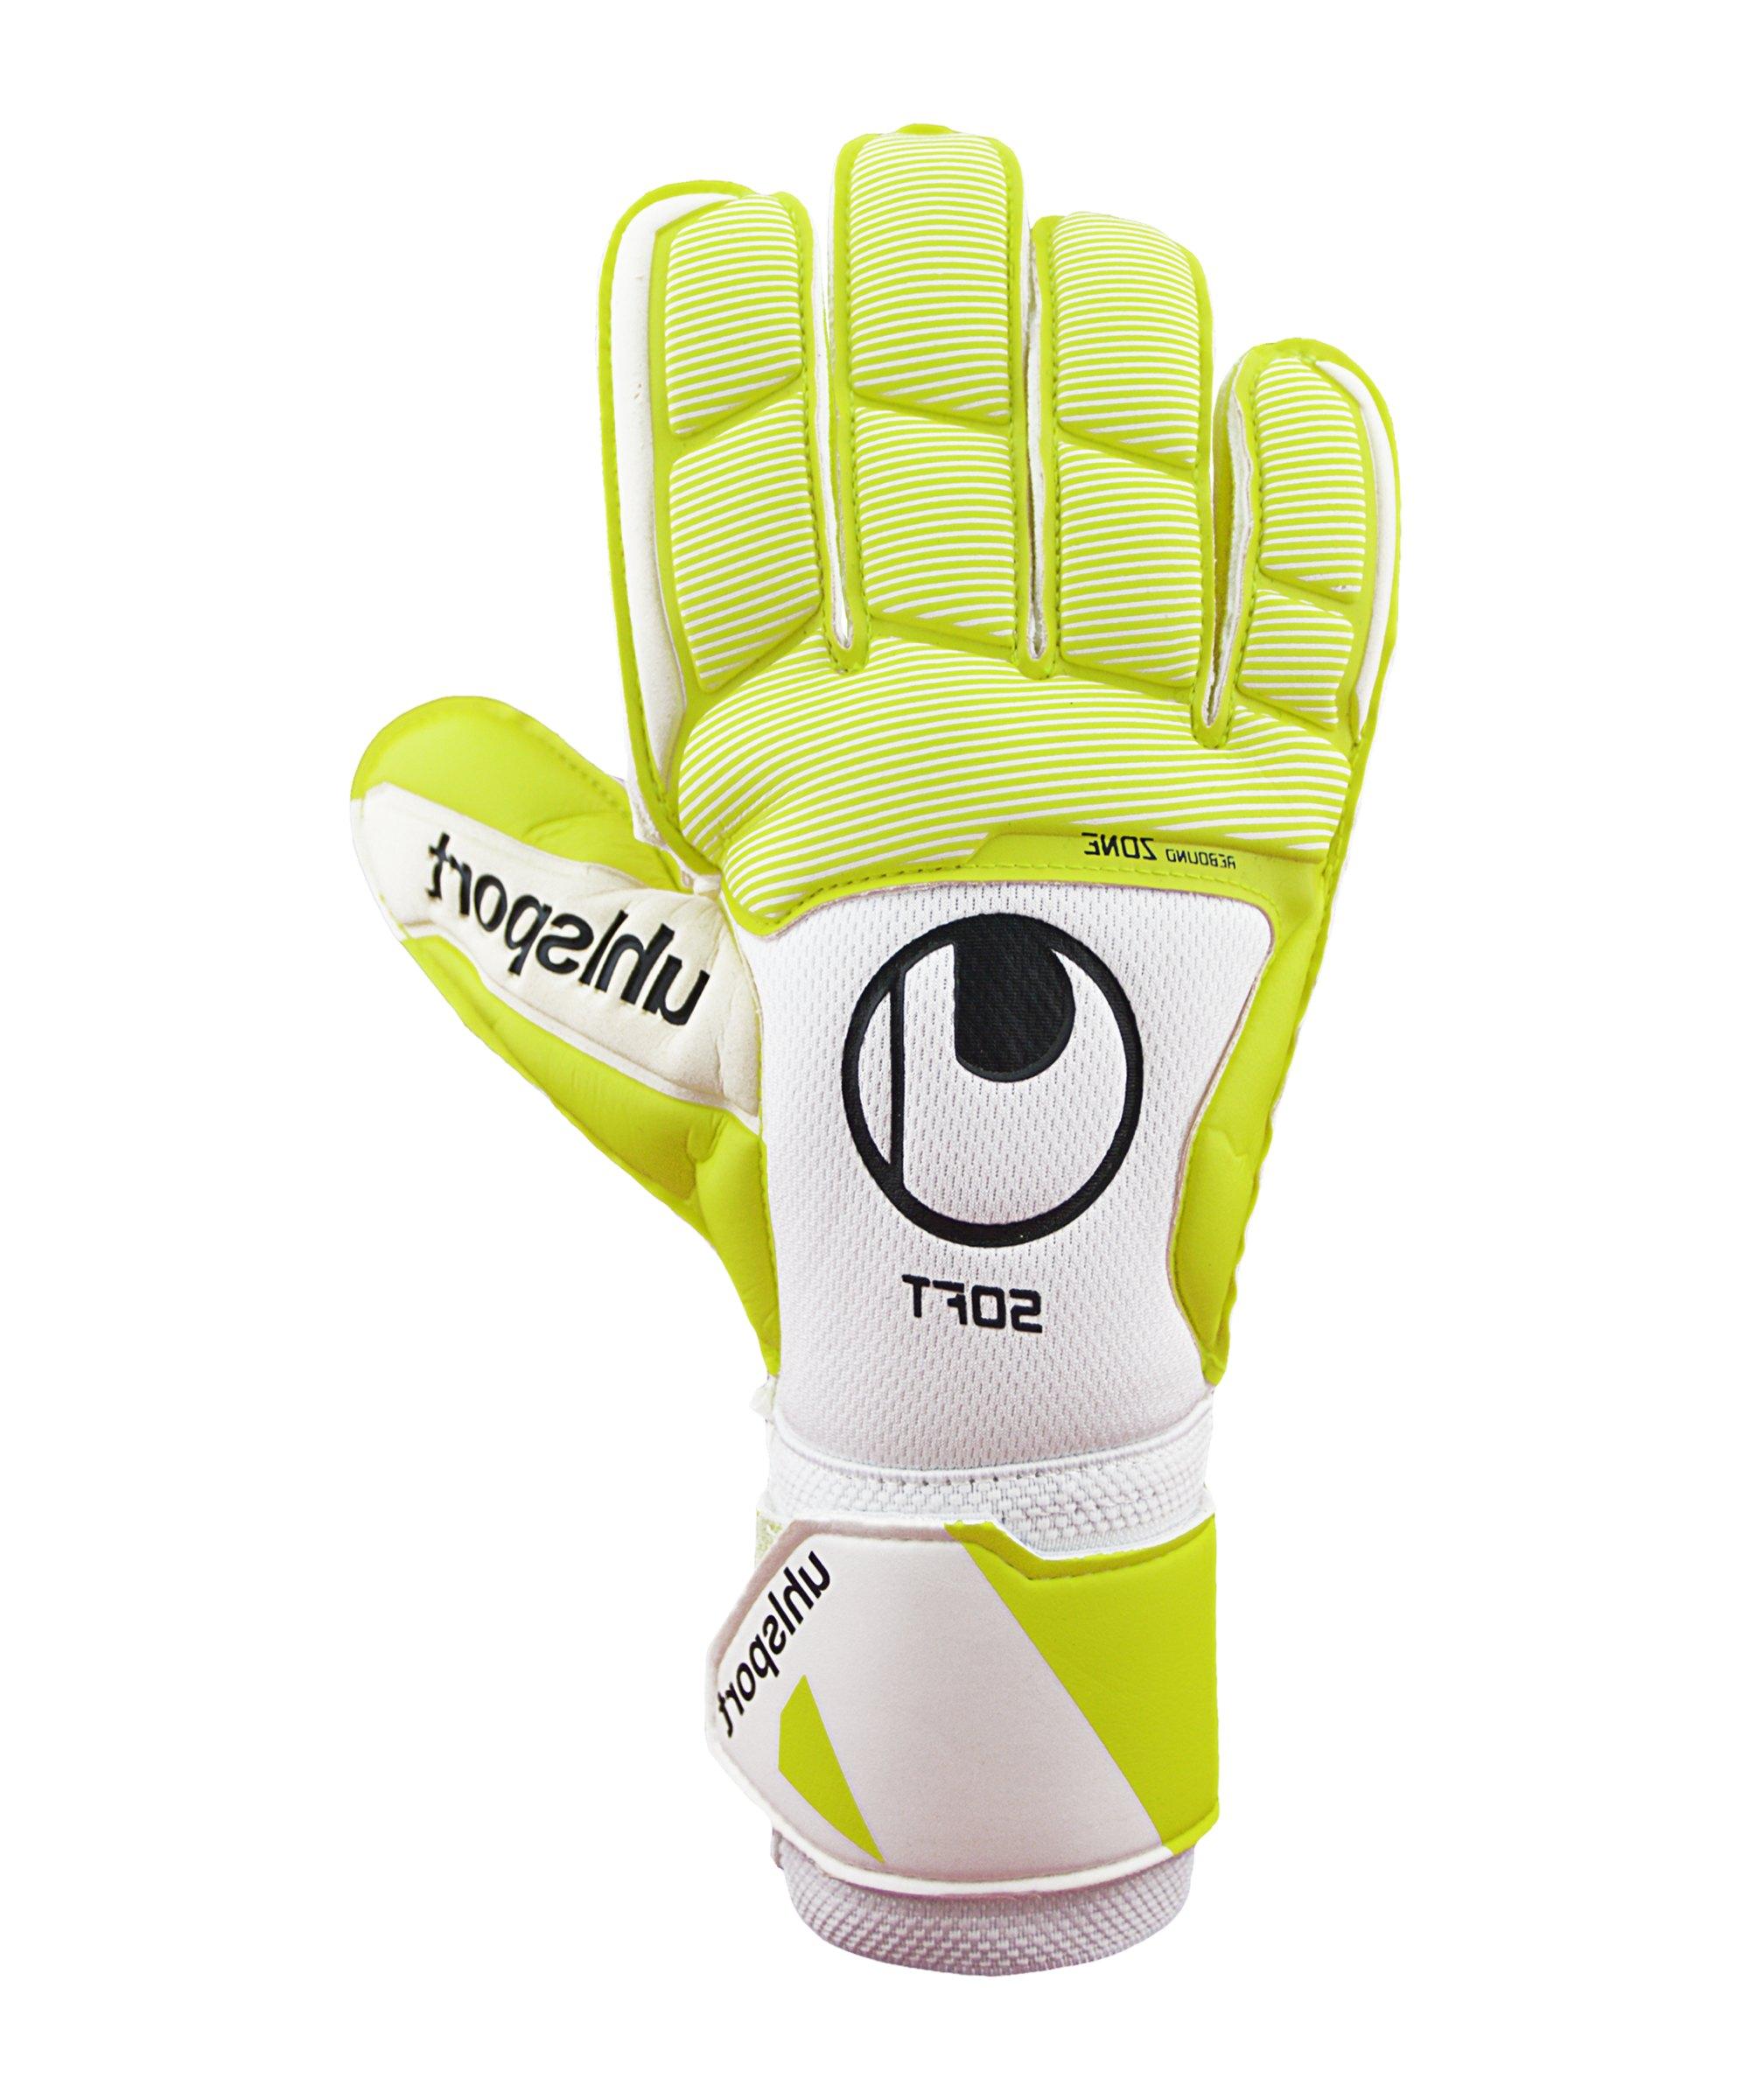 Uhlsport Pure Alliance Soft Pro TW-Handschuh F01 - weiss